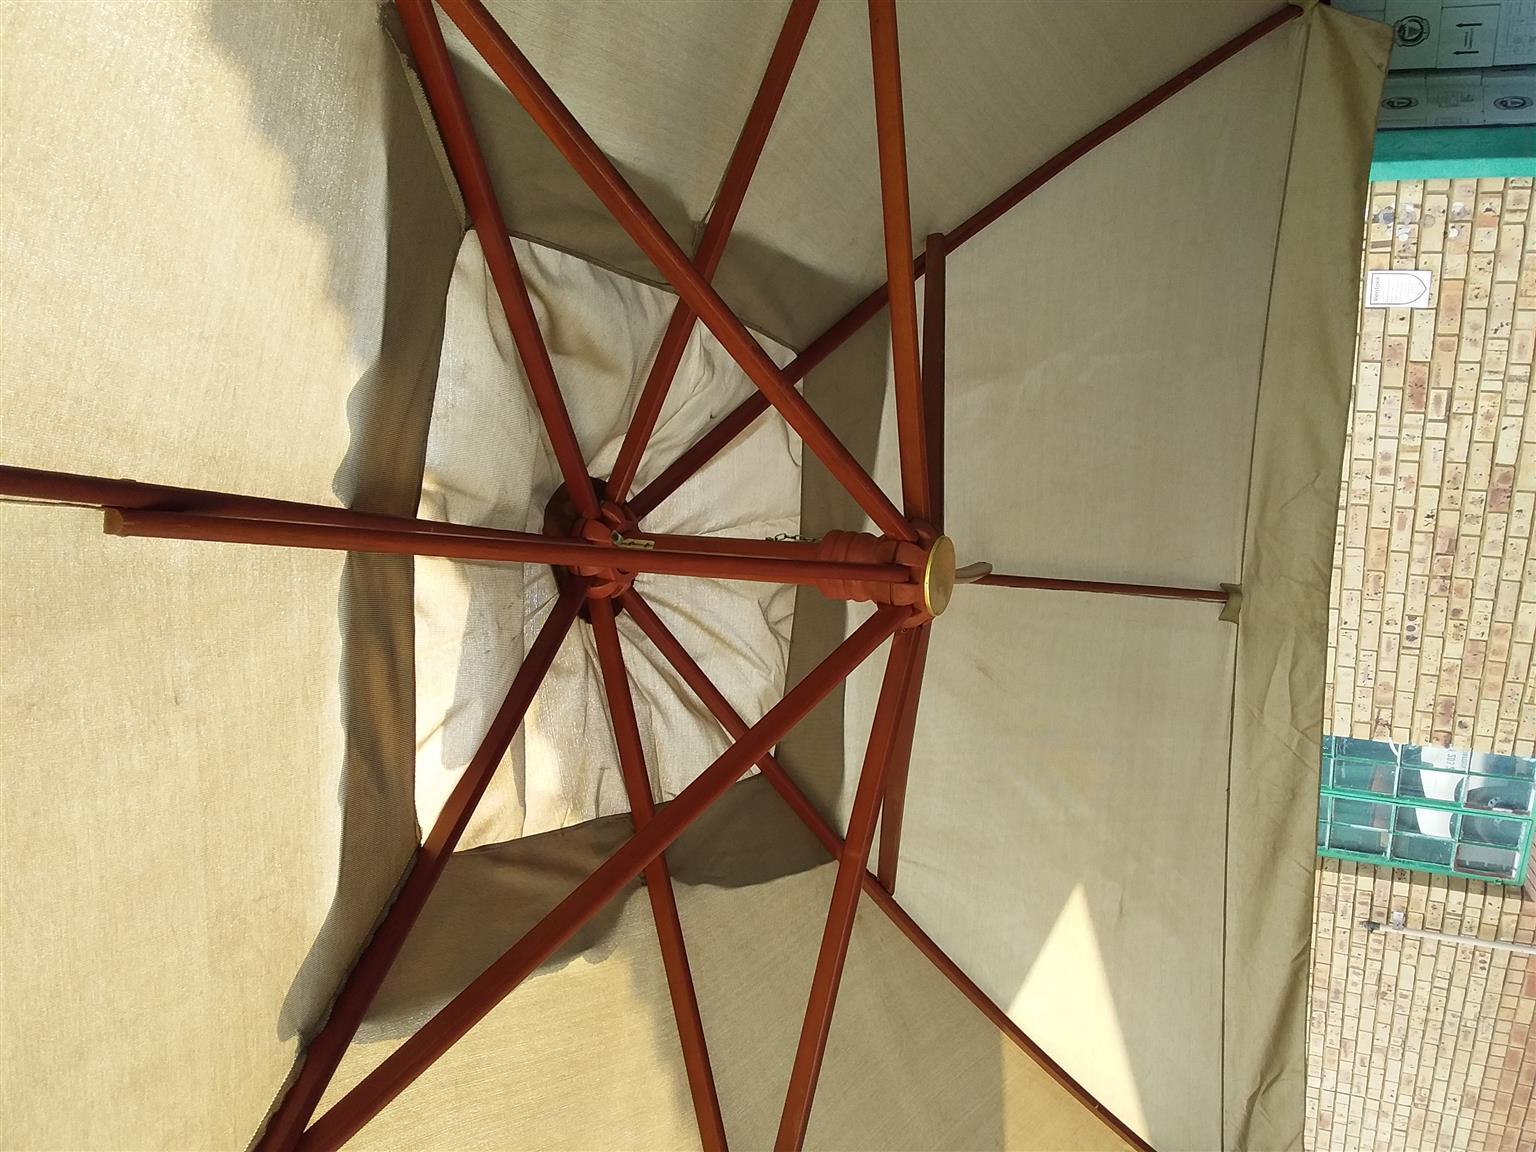 4 meter square cantilever wooden frame umbrella